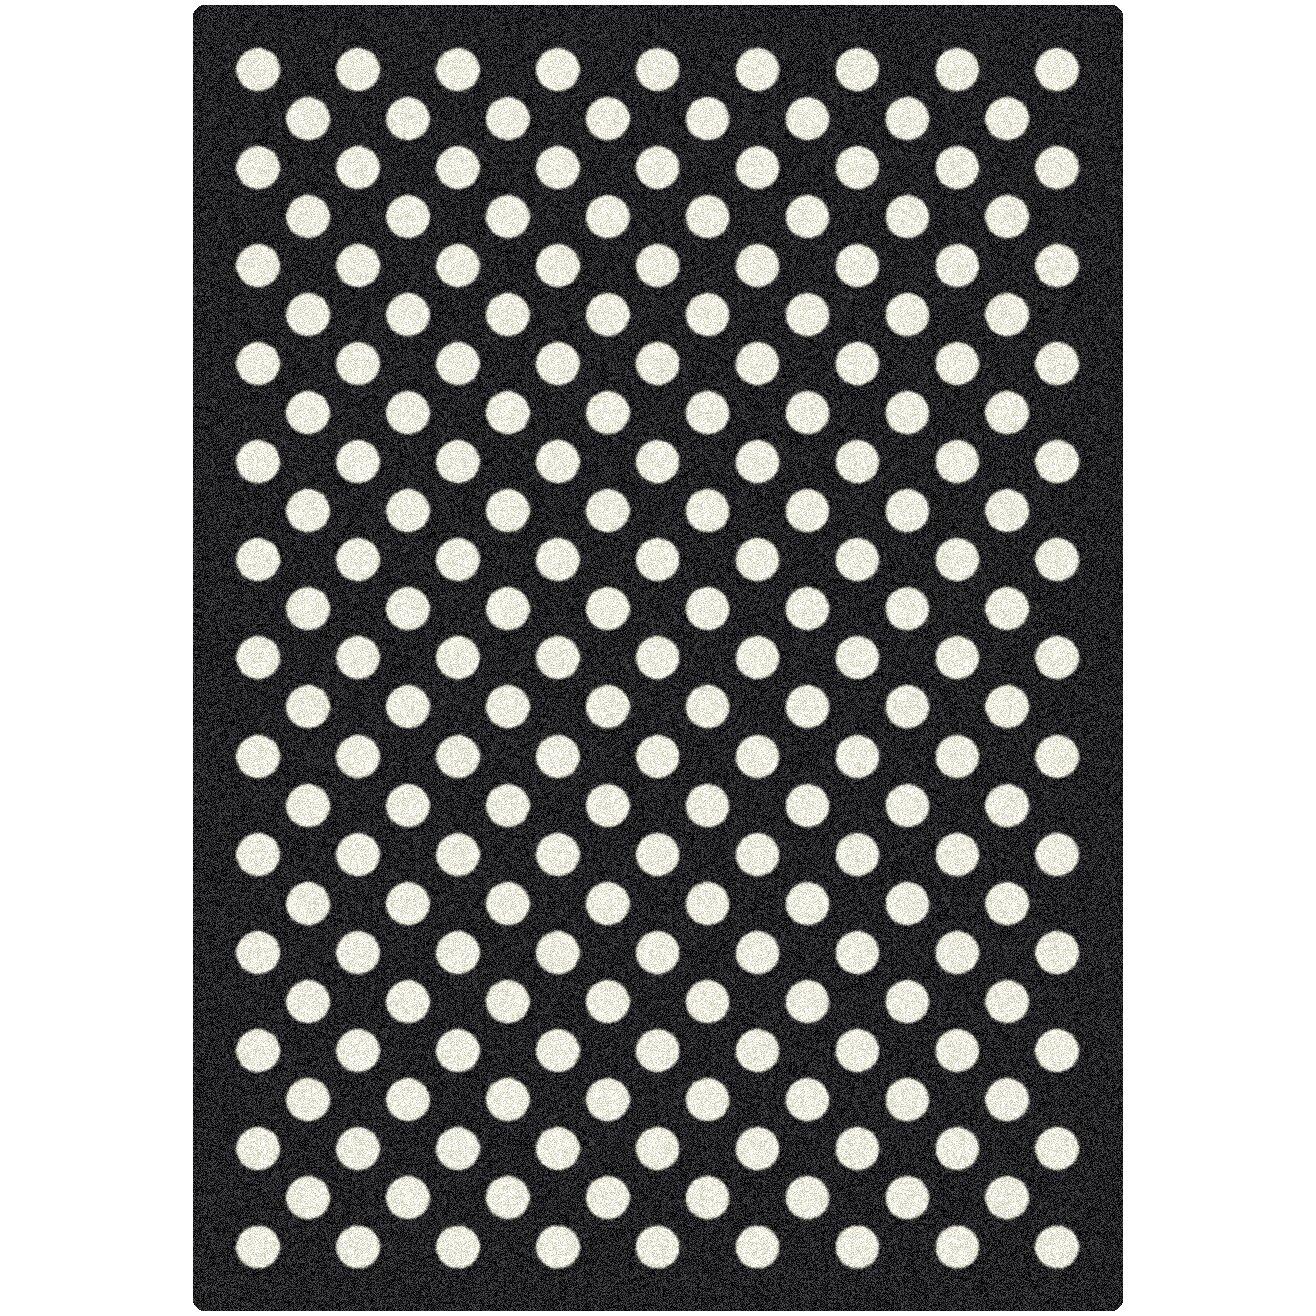 Black And White Floor Rug: Milliken Eclipse Nightfall Black/White Area Rug & Reviews